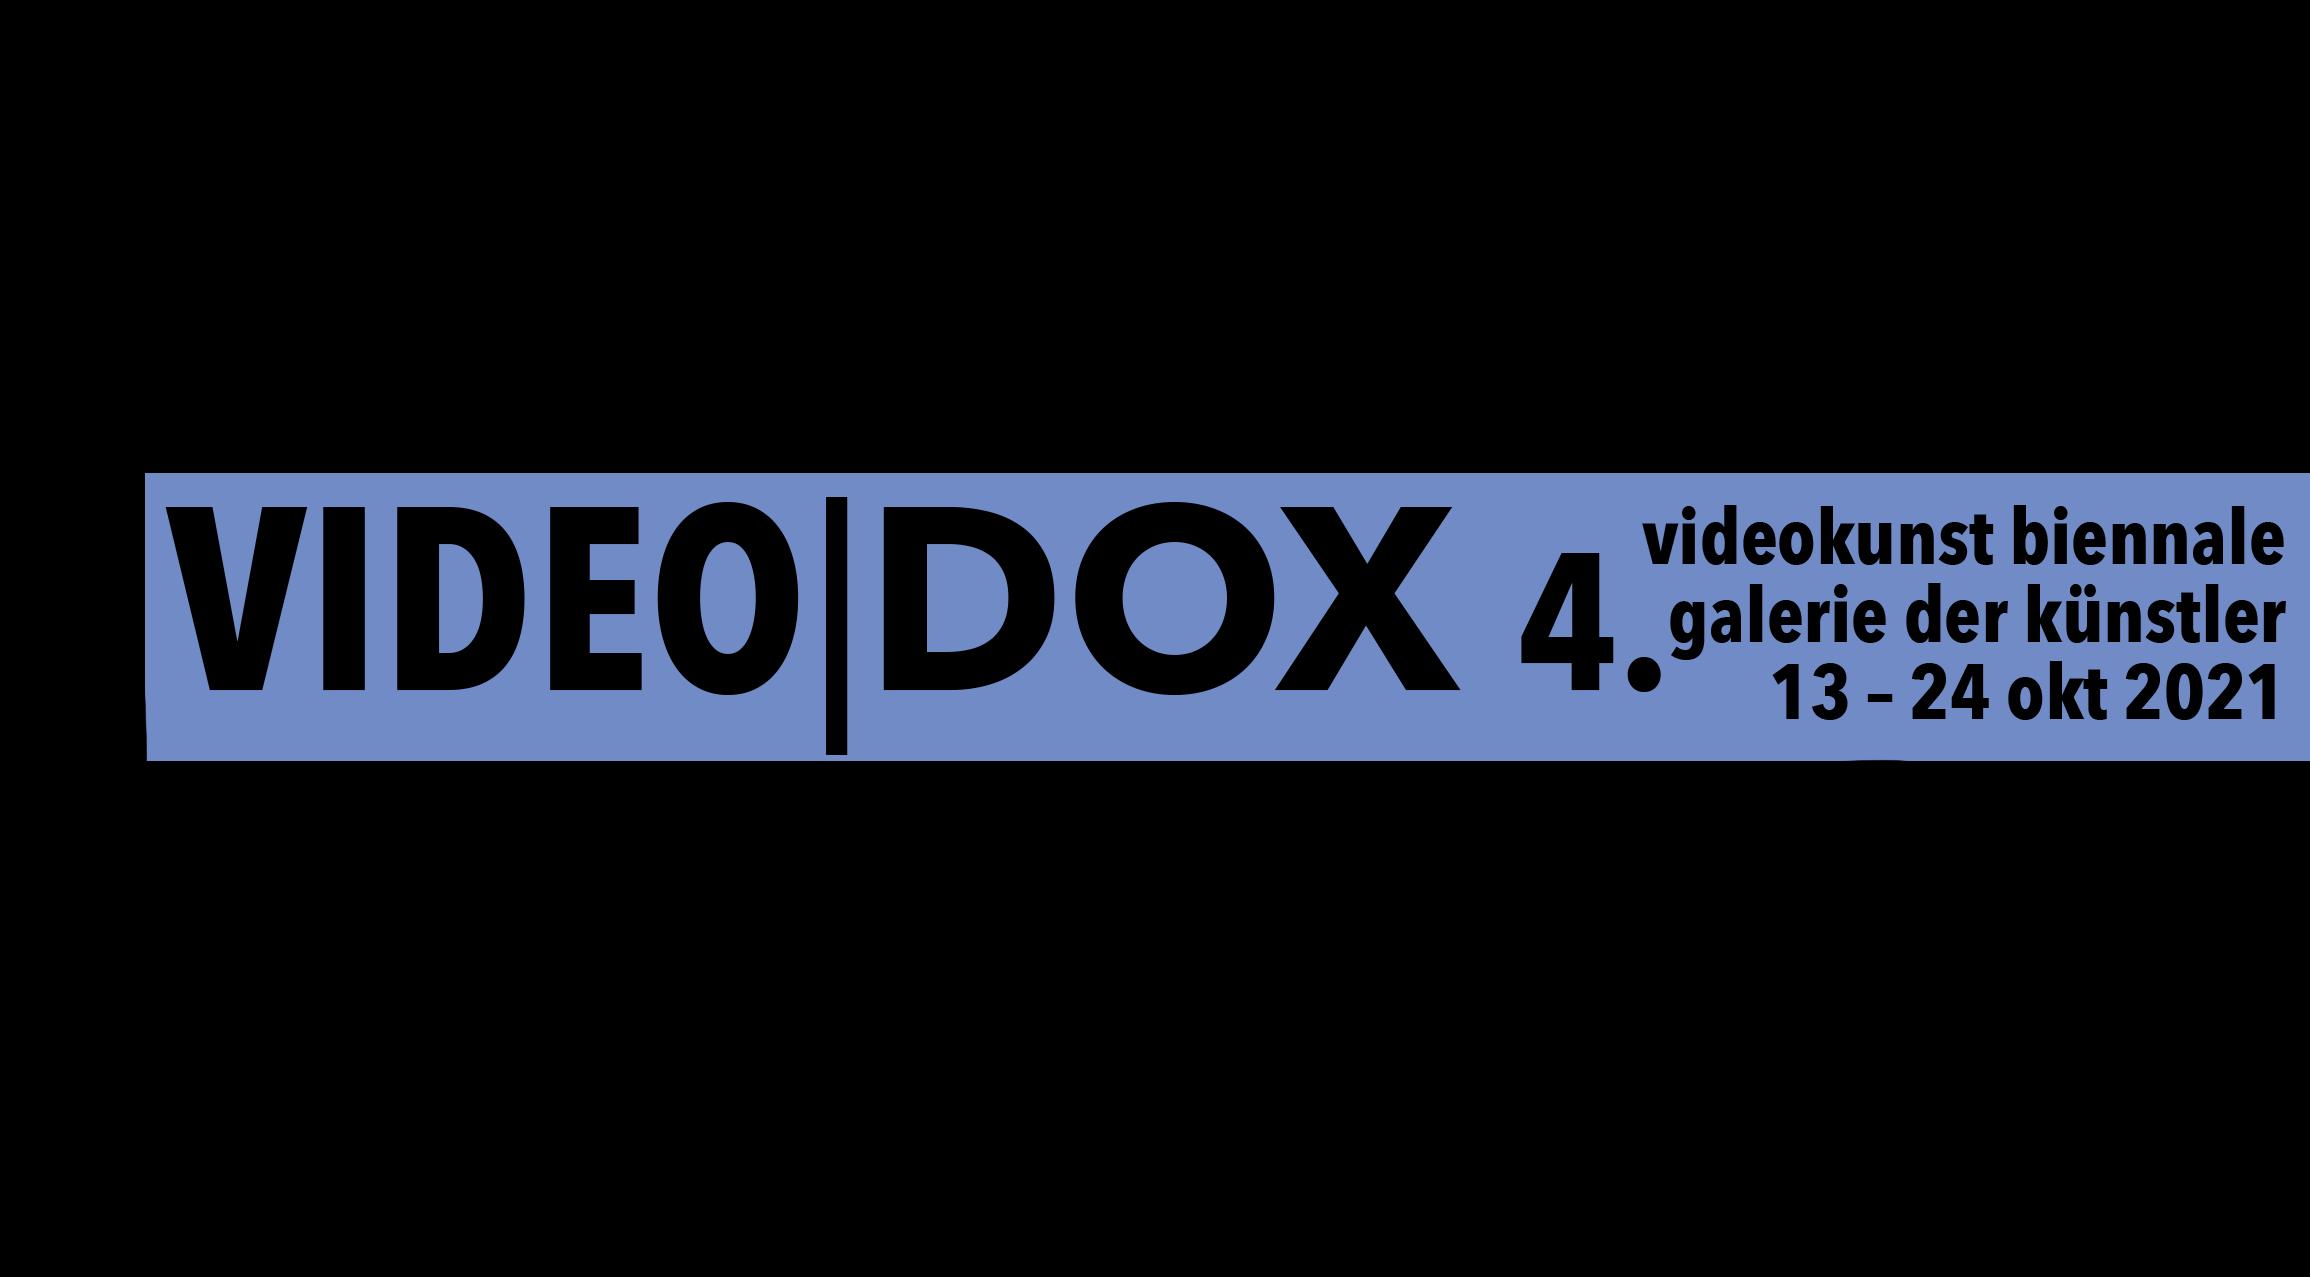 Videodox 2021 – Biennal Exposition for Video Art from Bavaria